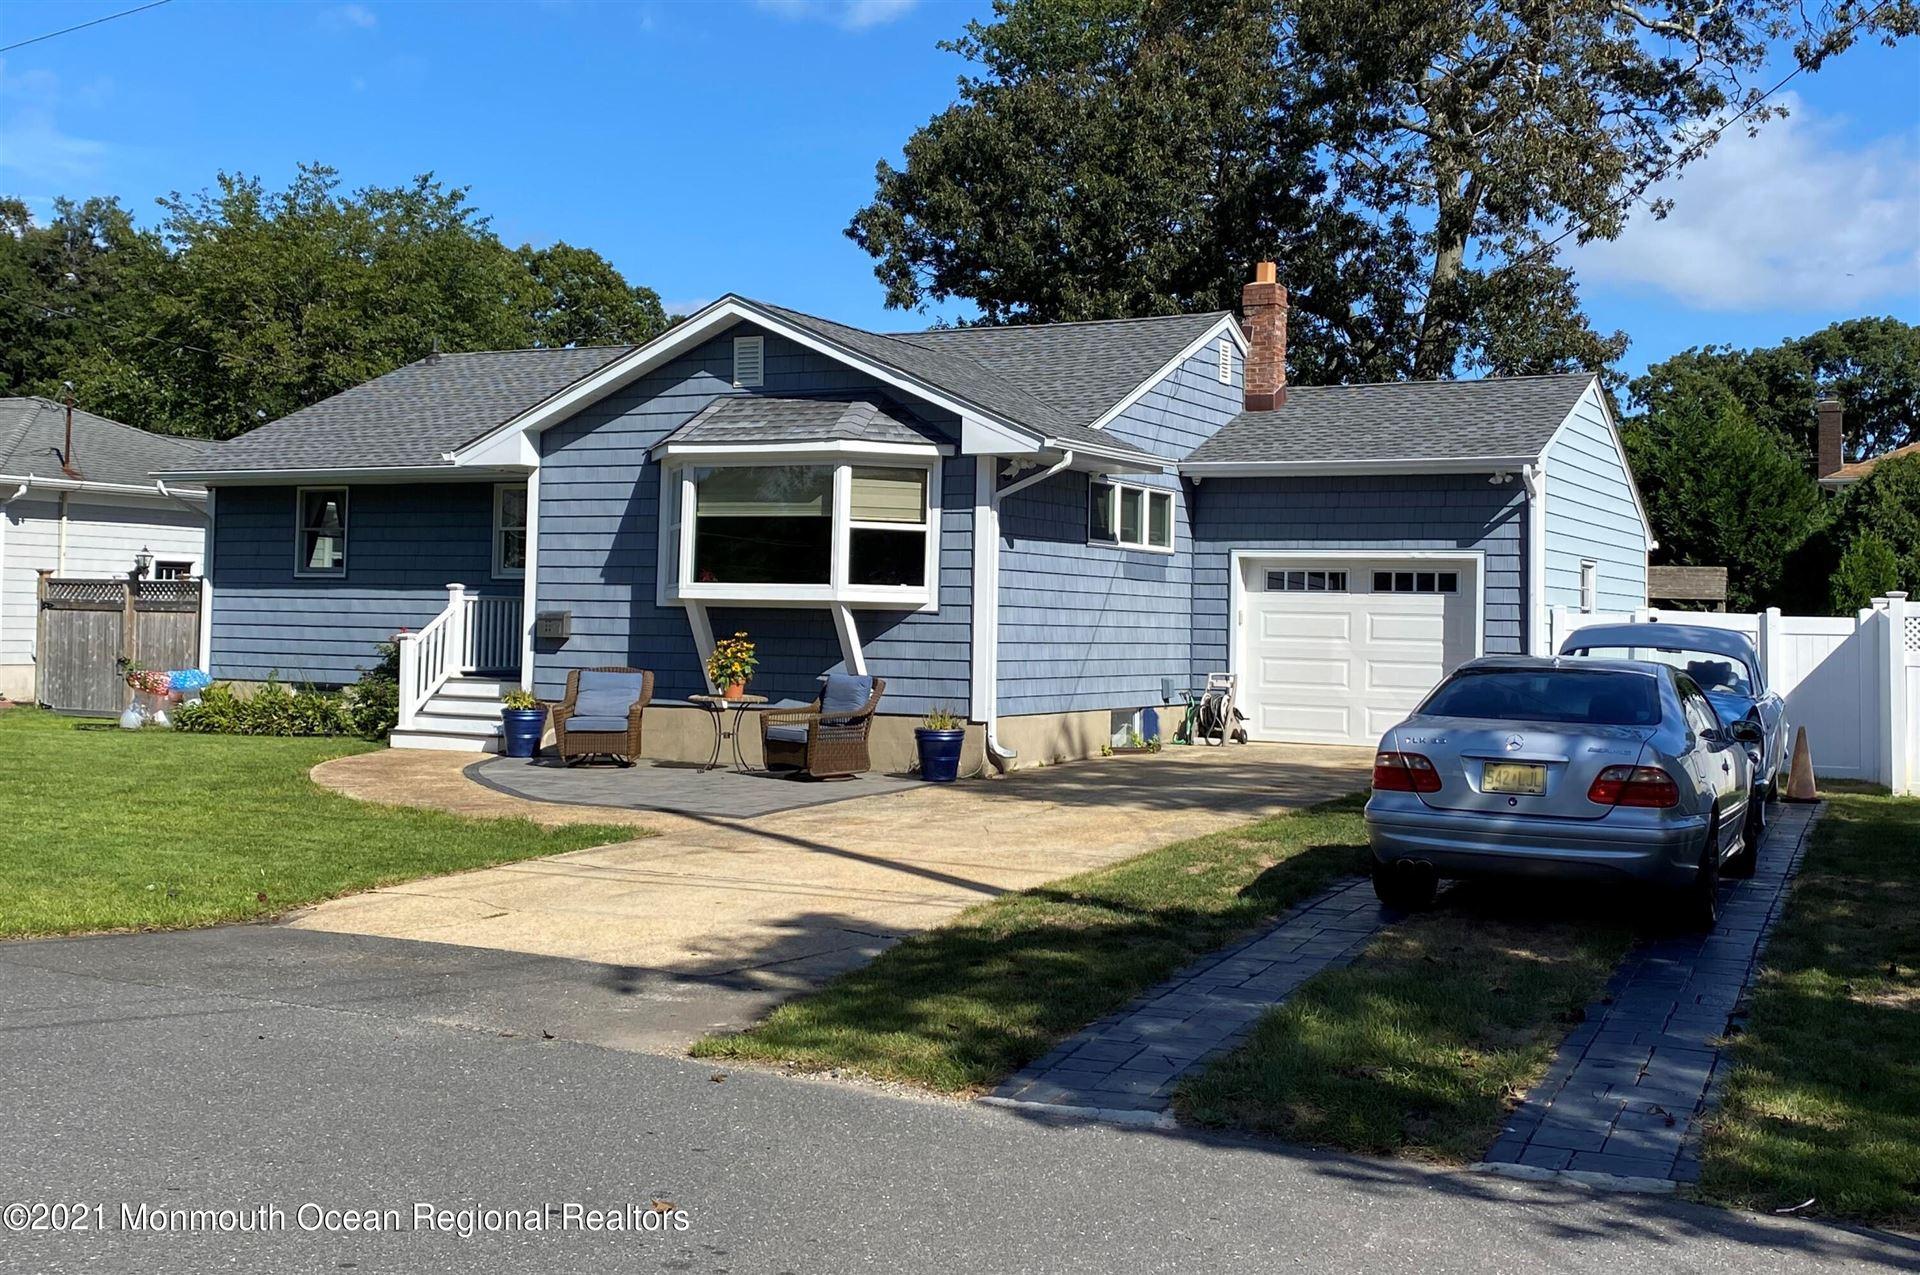 821 Fay Court, Point Pleasant, NJ 08742 - #: 22128483